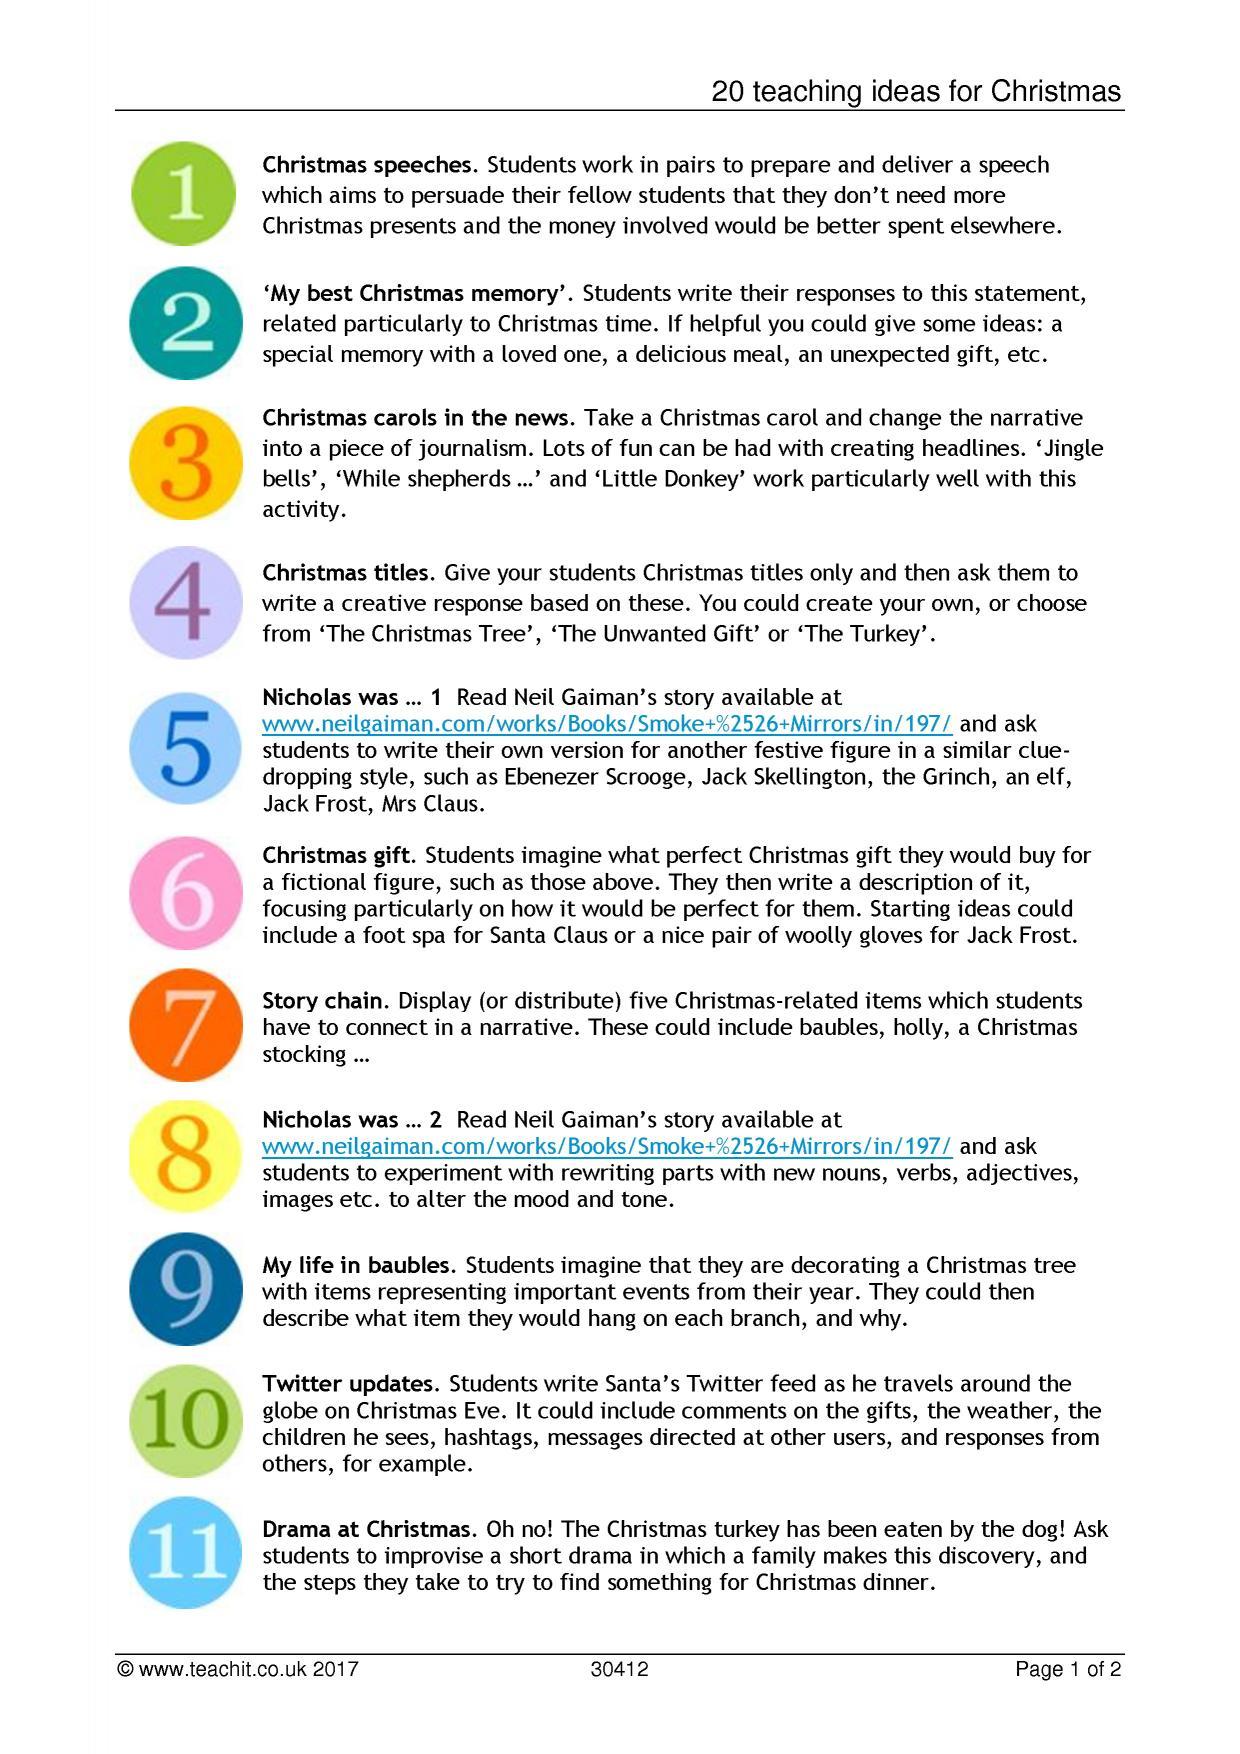 20 Teaching Ideas For Christmas